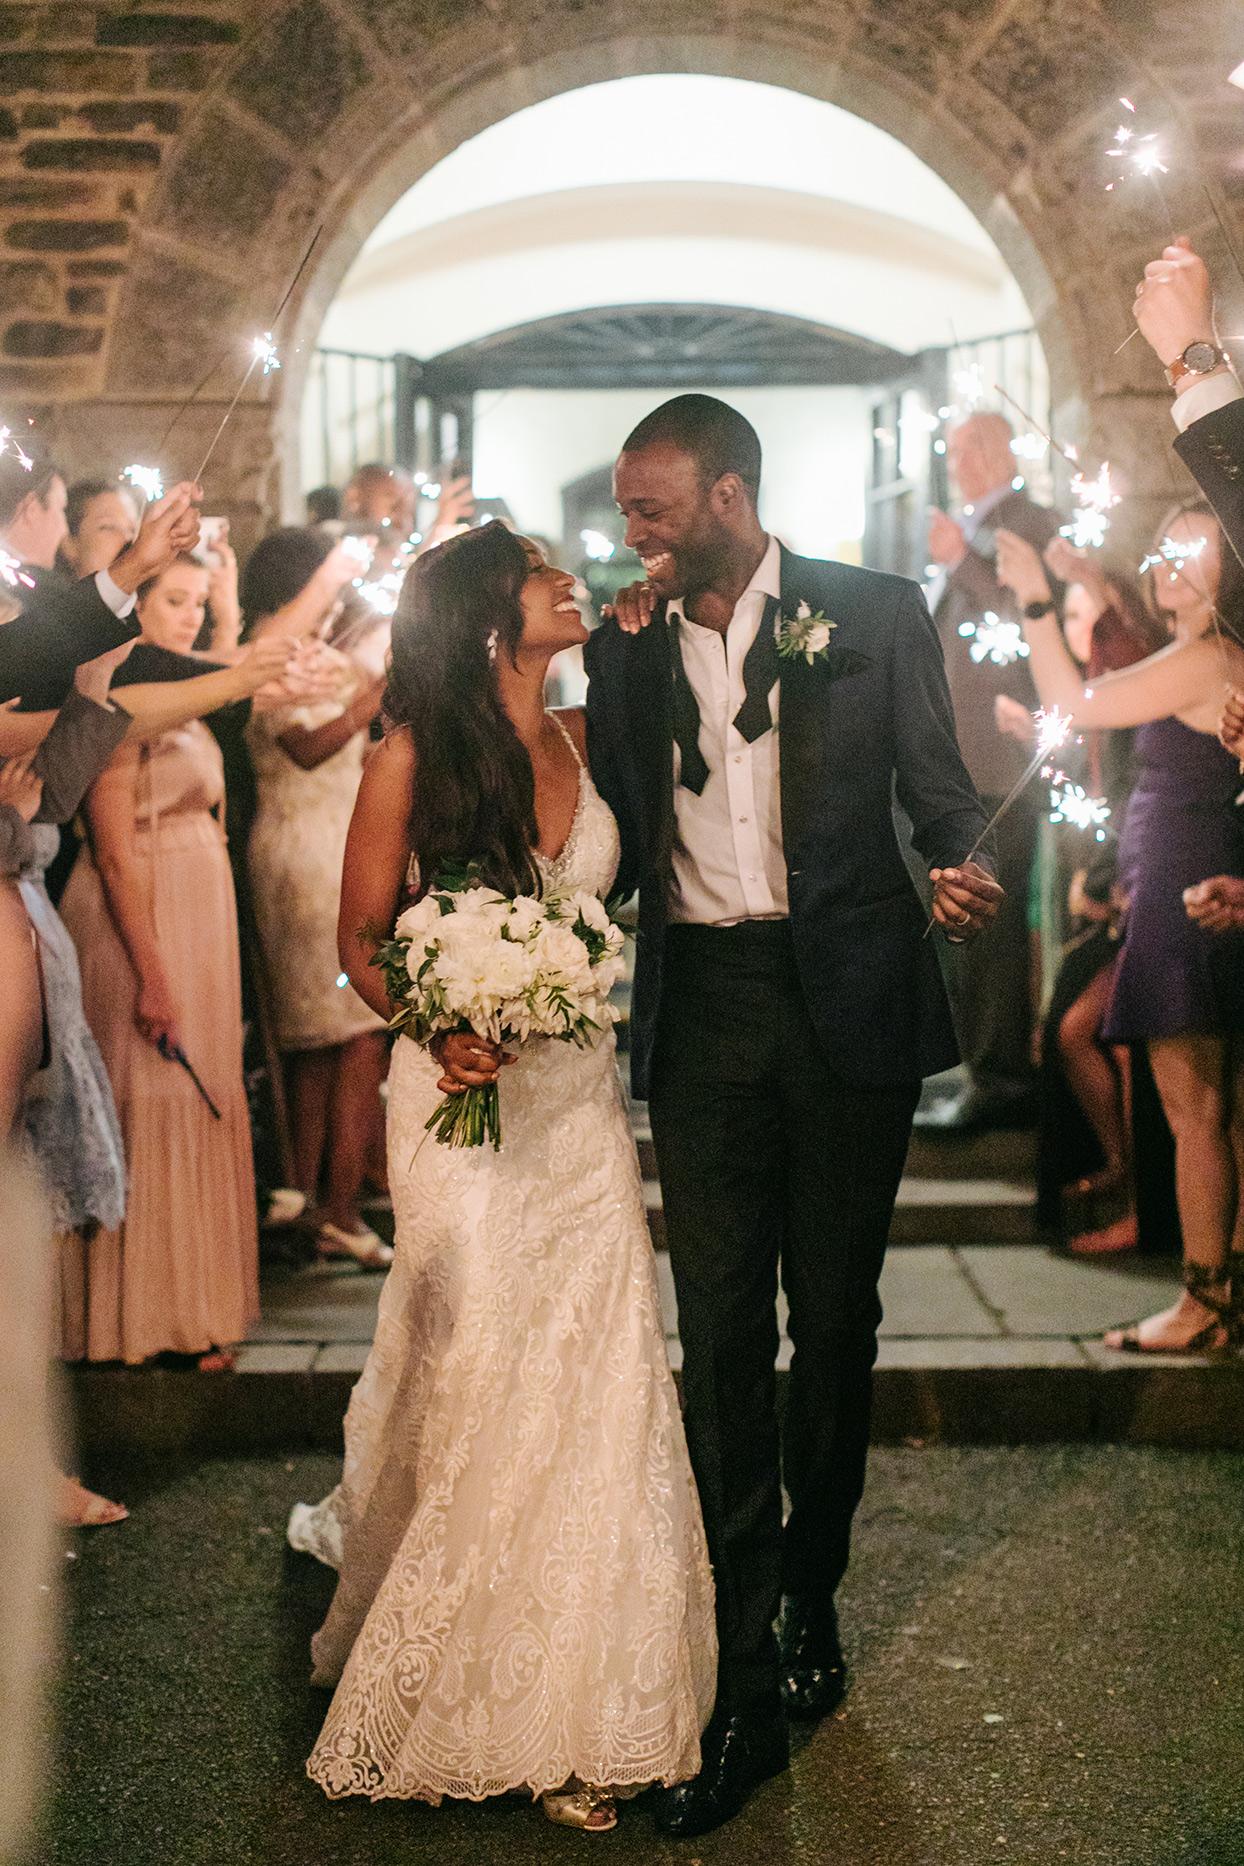 bride and groom exiting wedding reception under sparklers